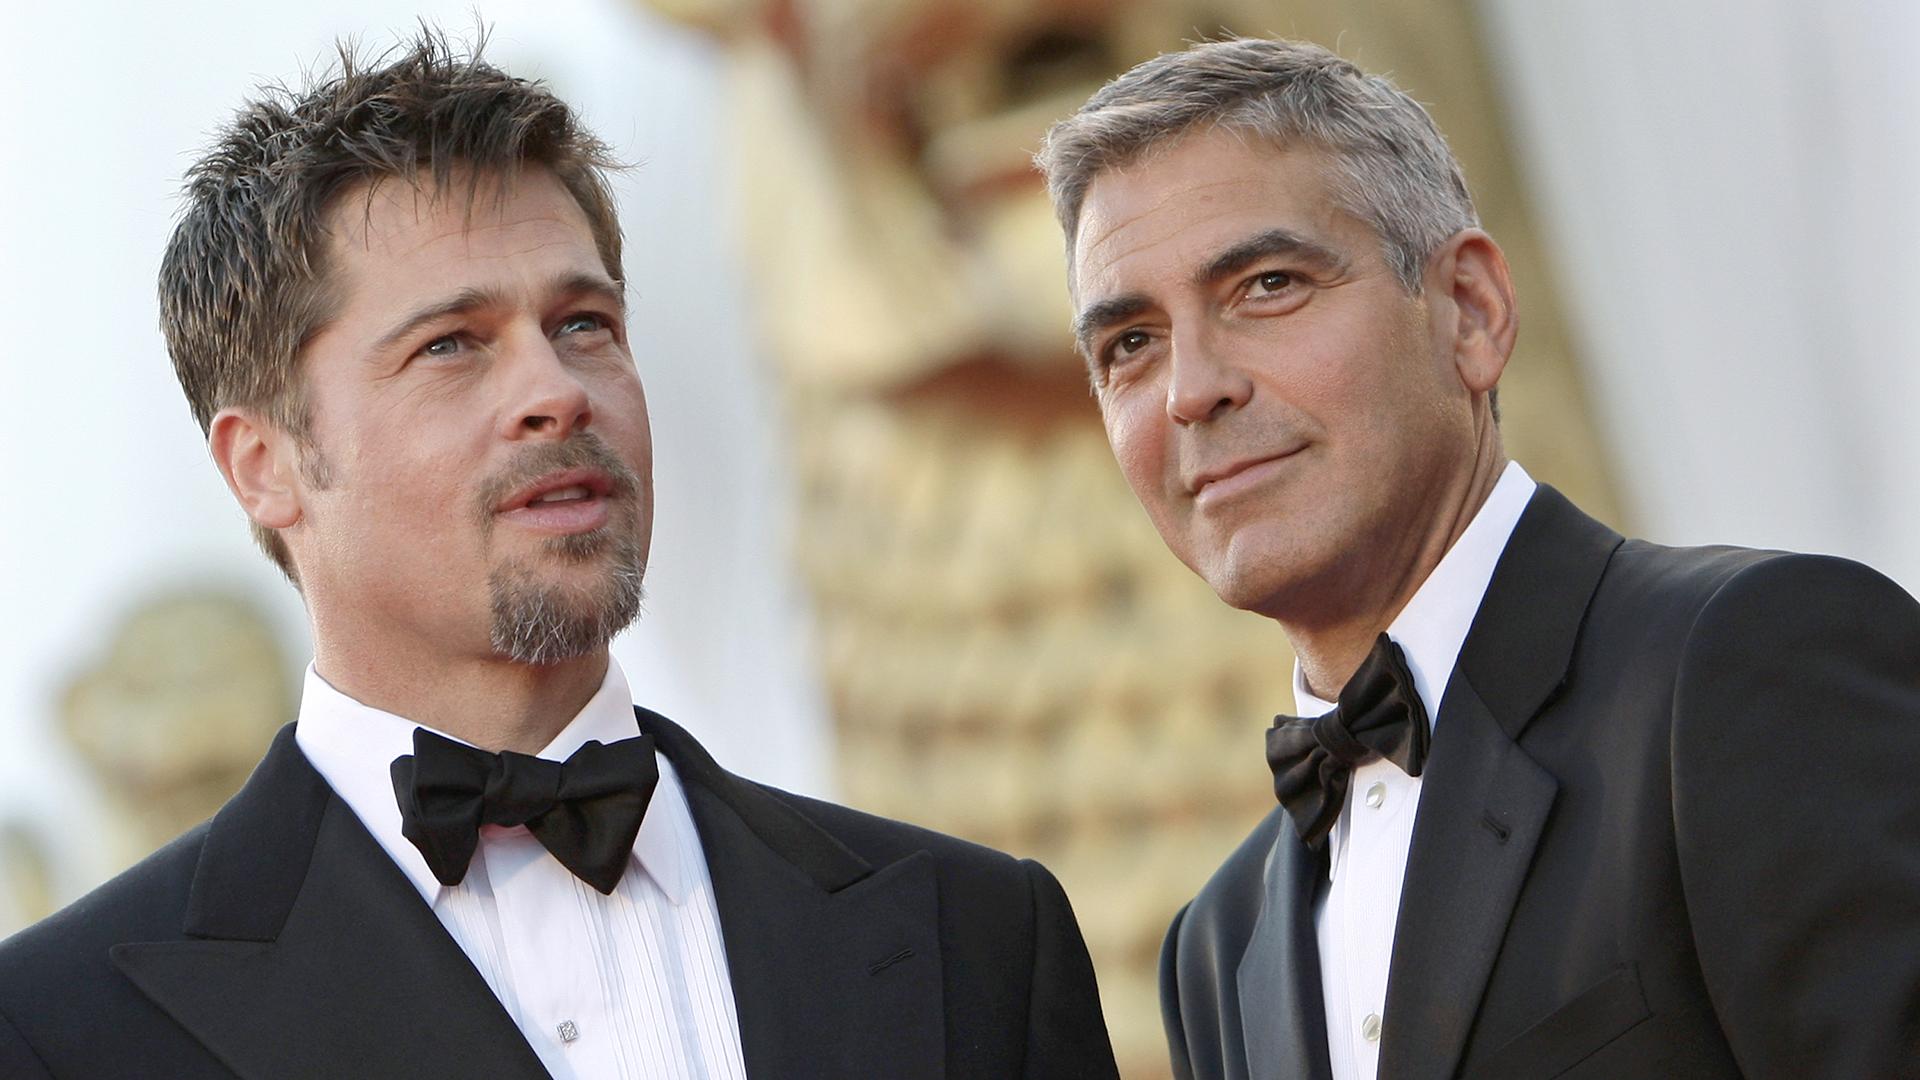 Watch George Clooney learn about Brad Pitt, Angelina Jolie divorce ... Brangelina